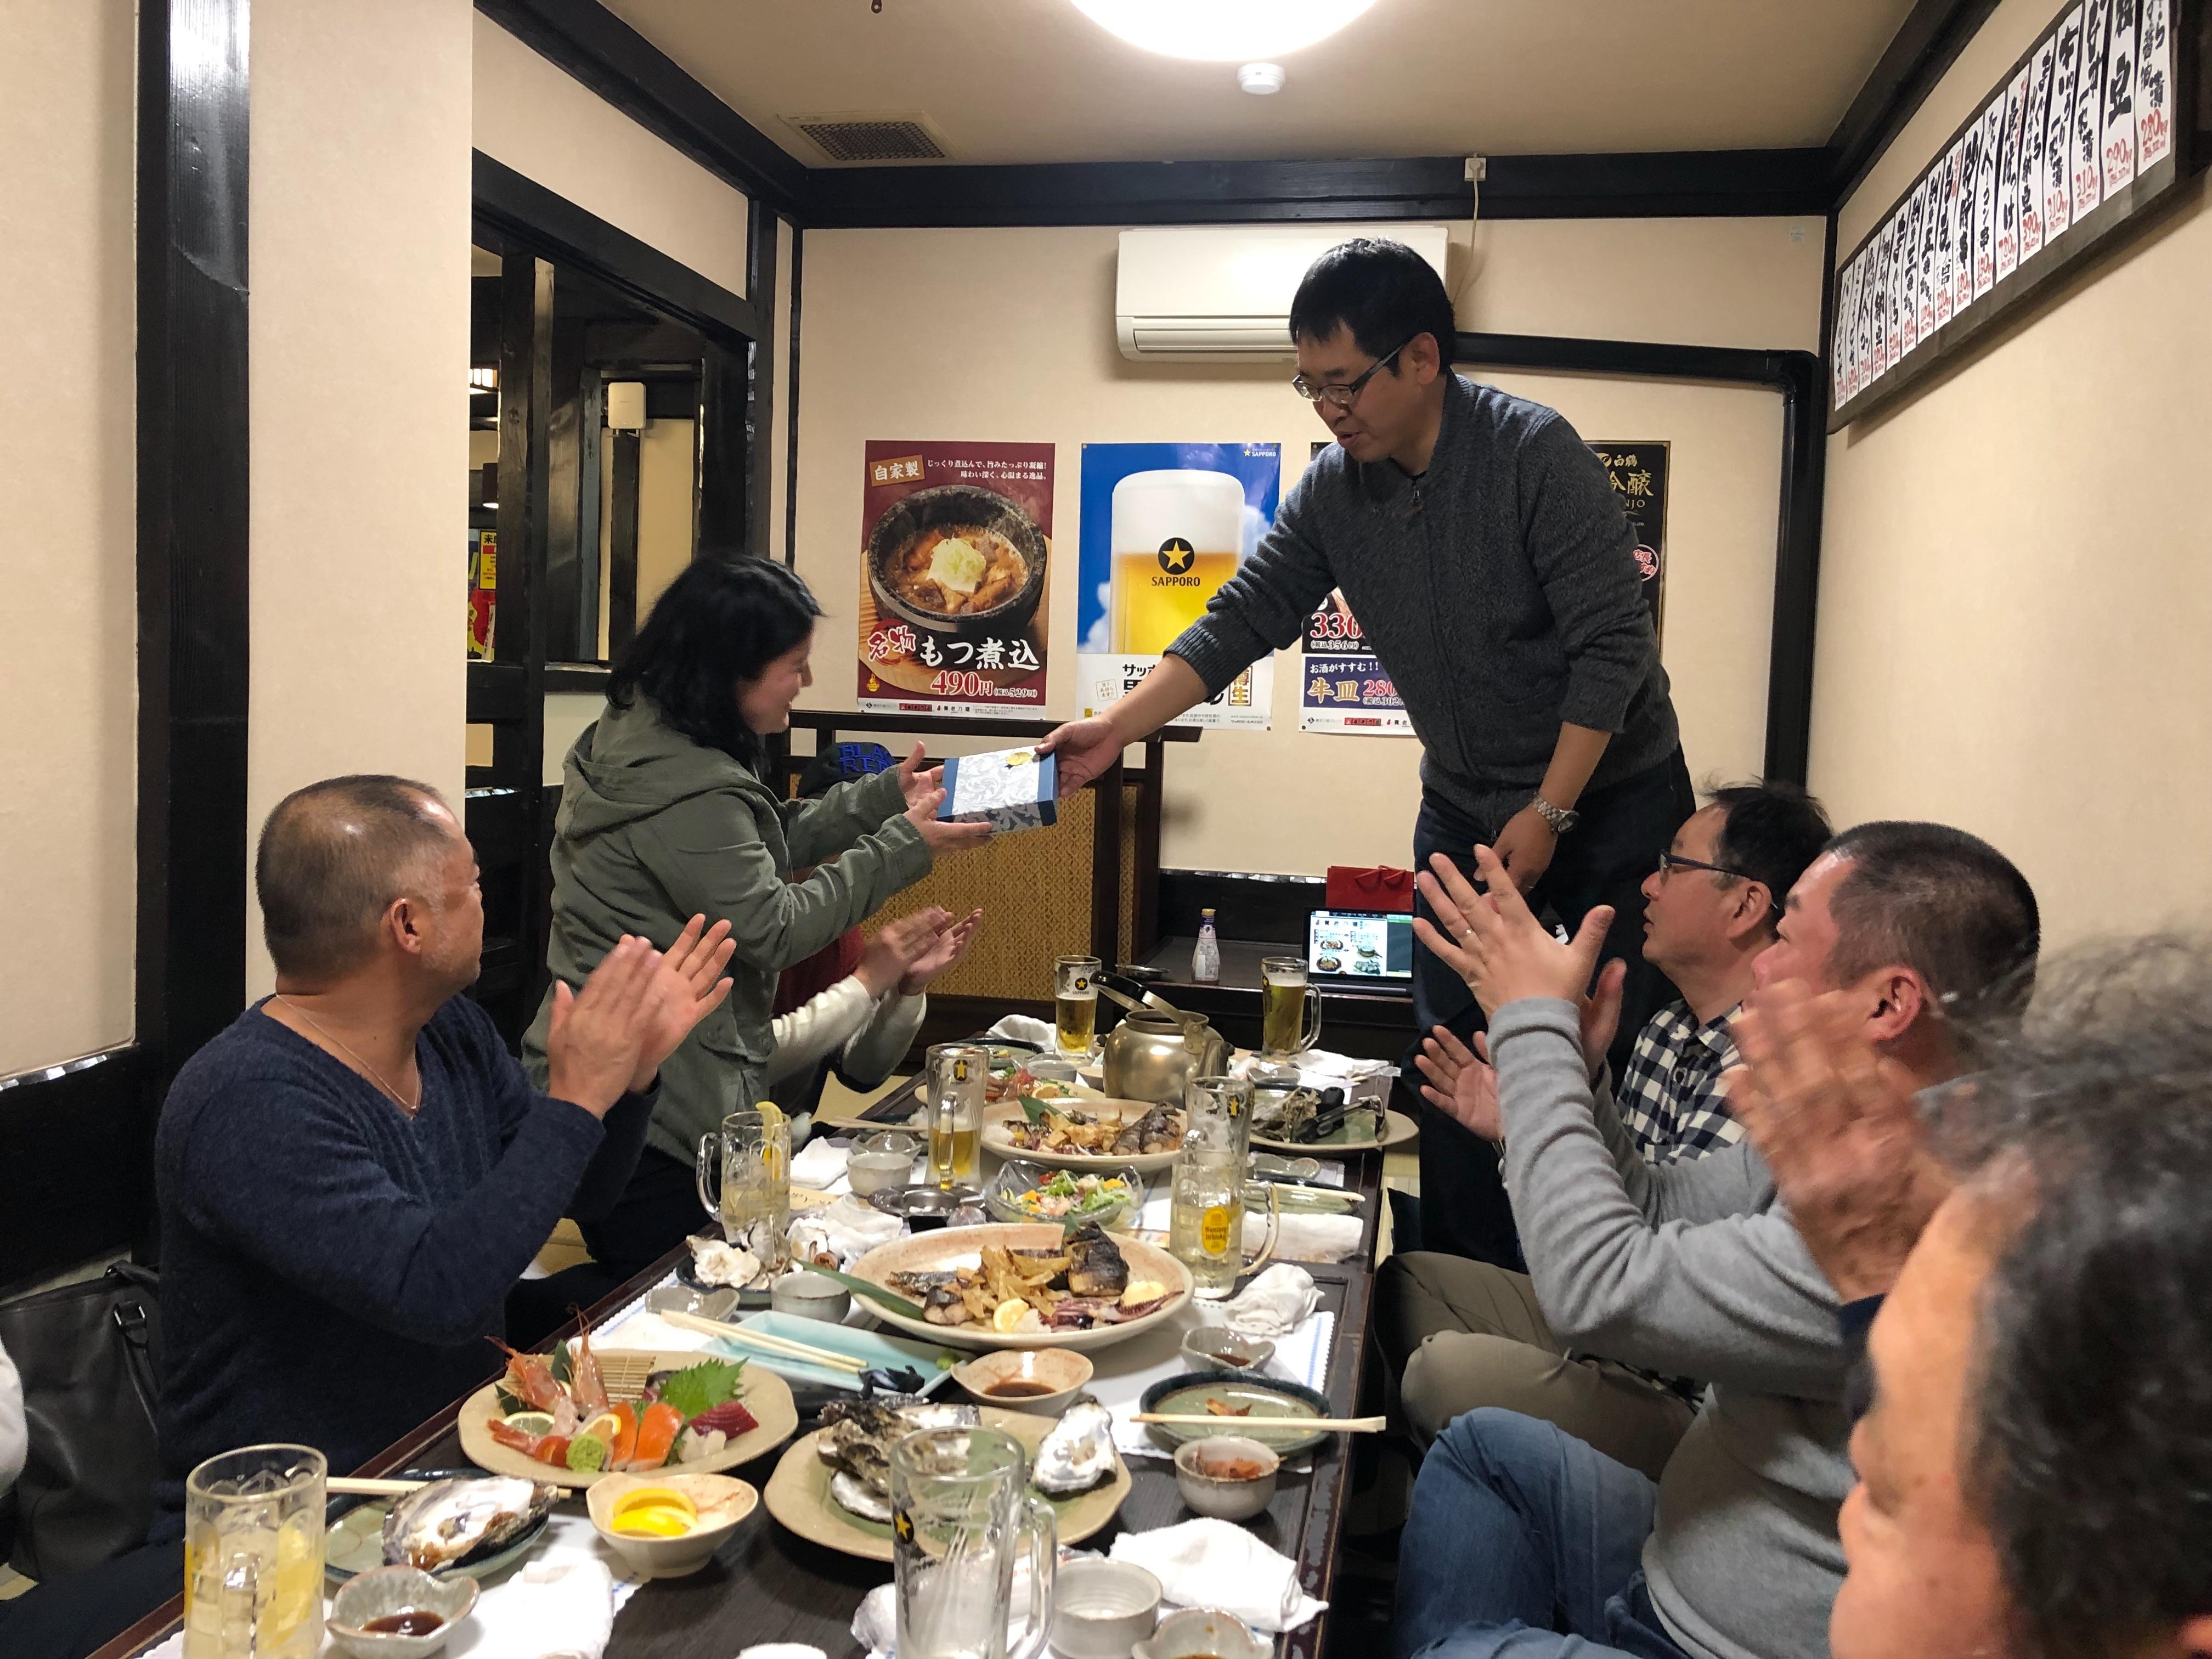 f:id:masanori-kato1972:20190325114950j:image